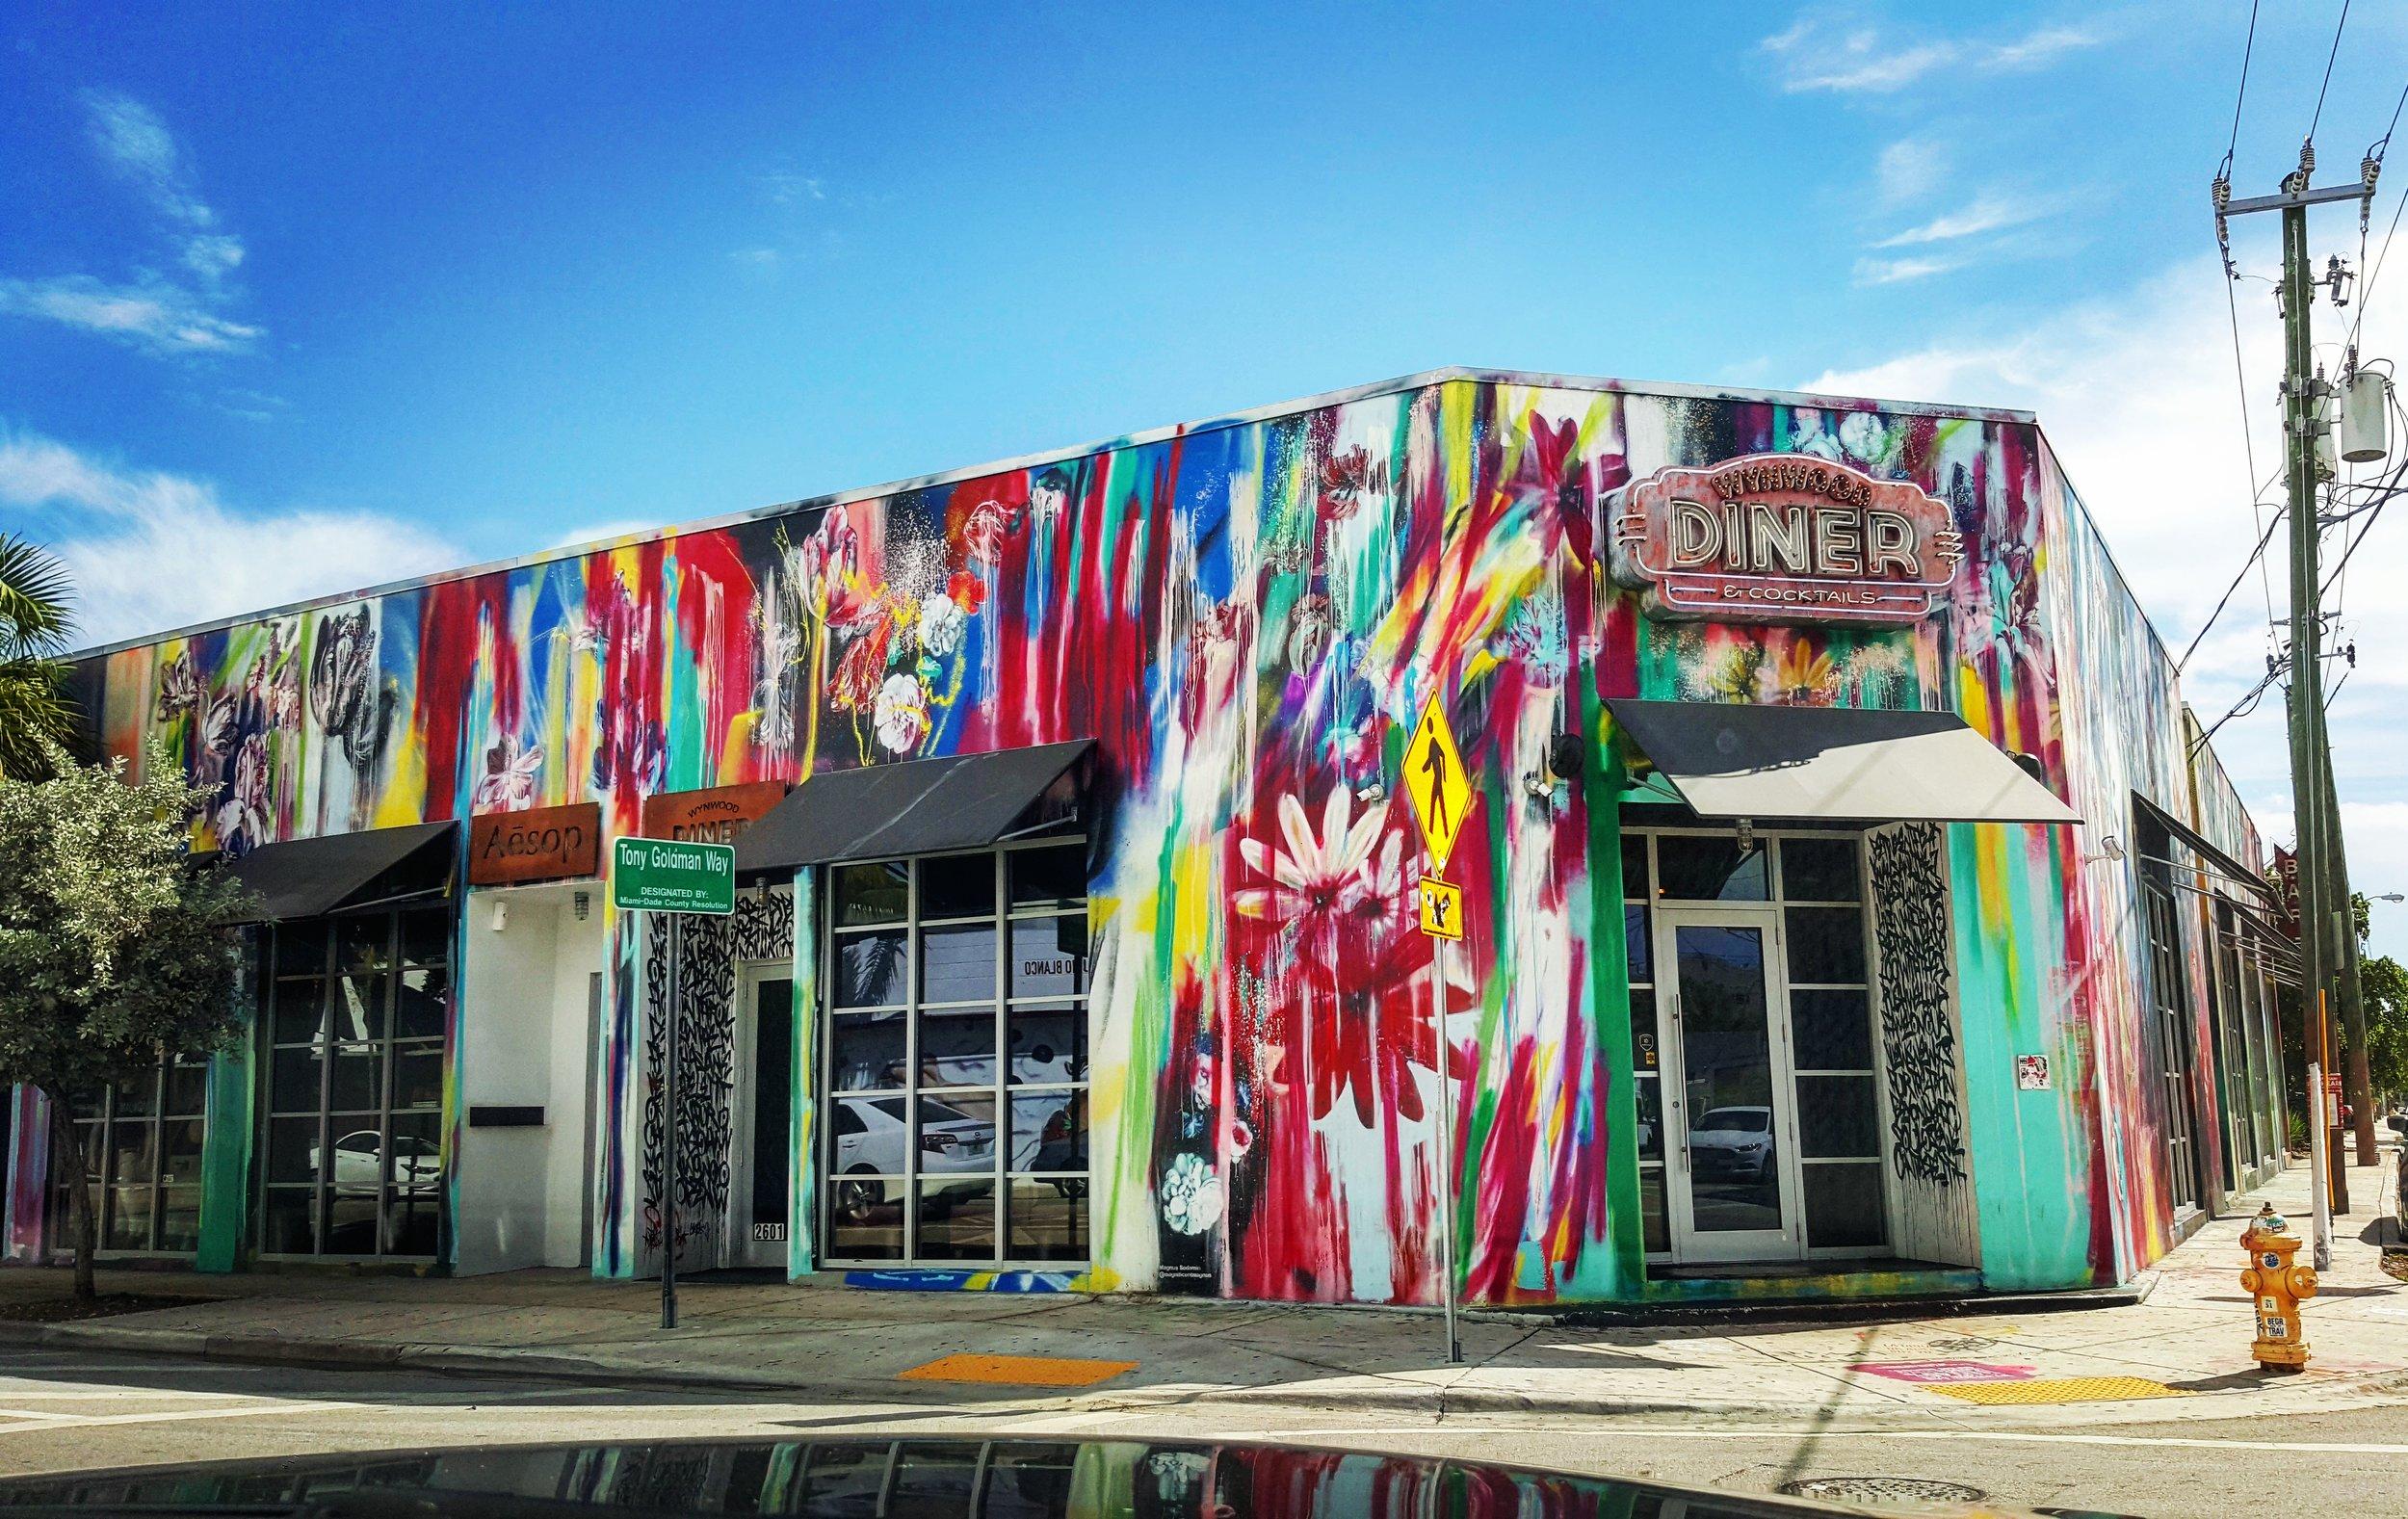 Wynwood Diner, Miami